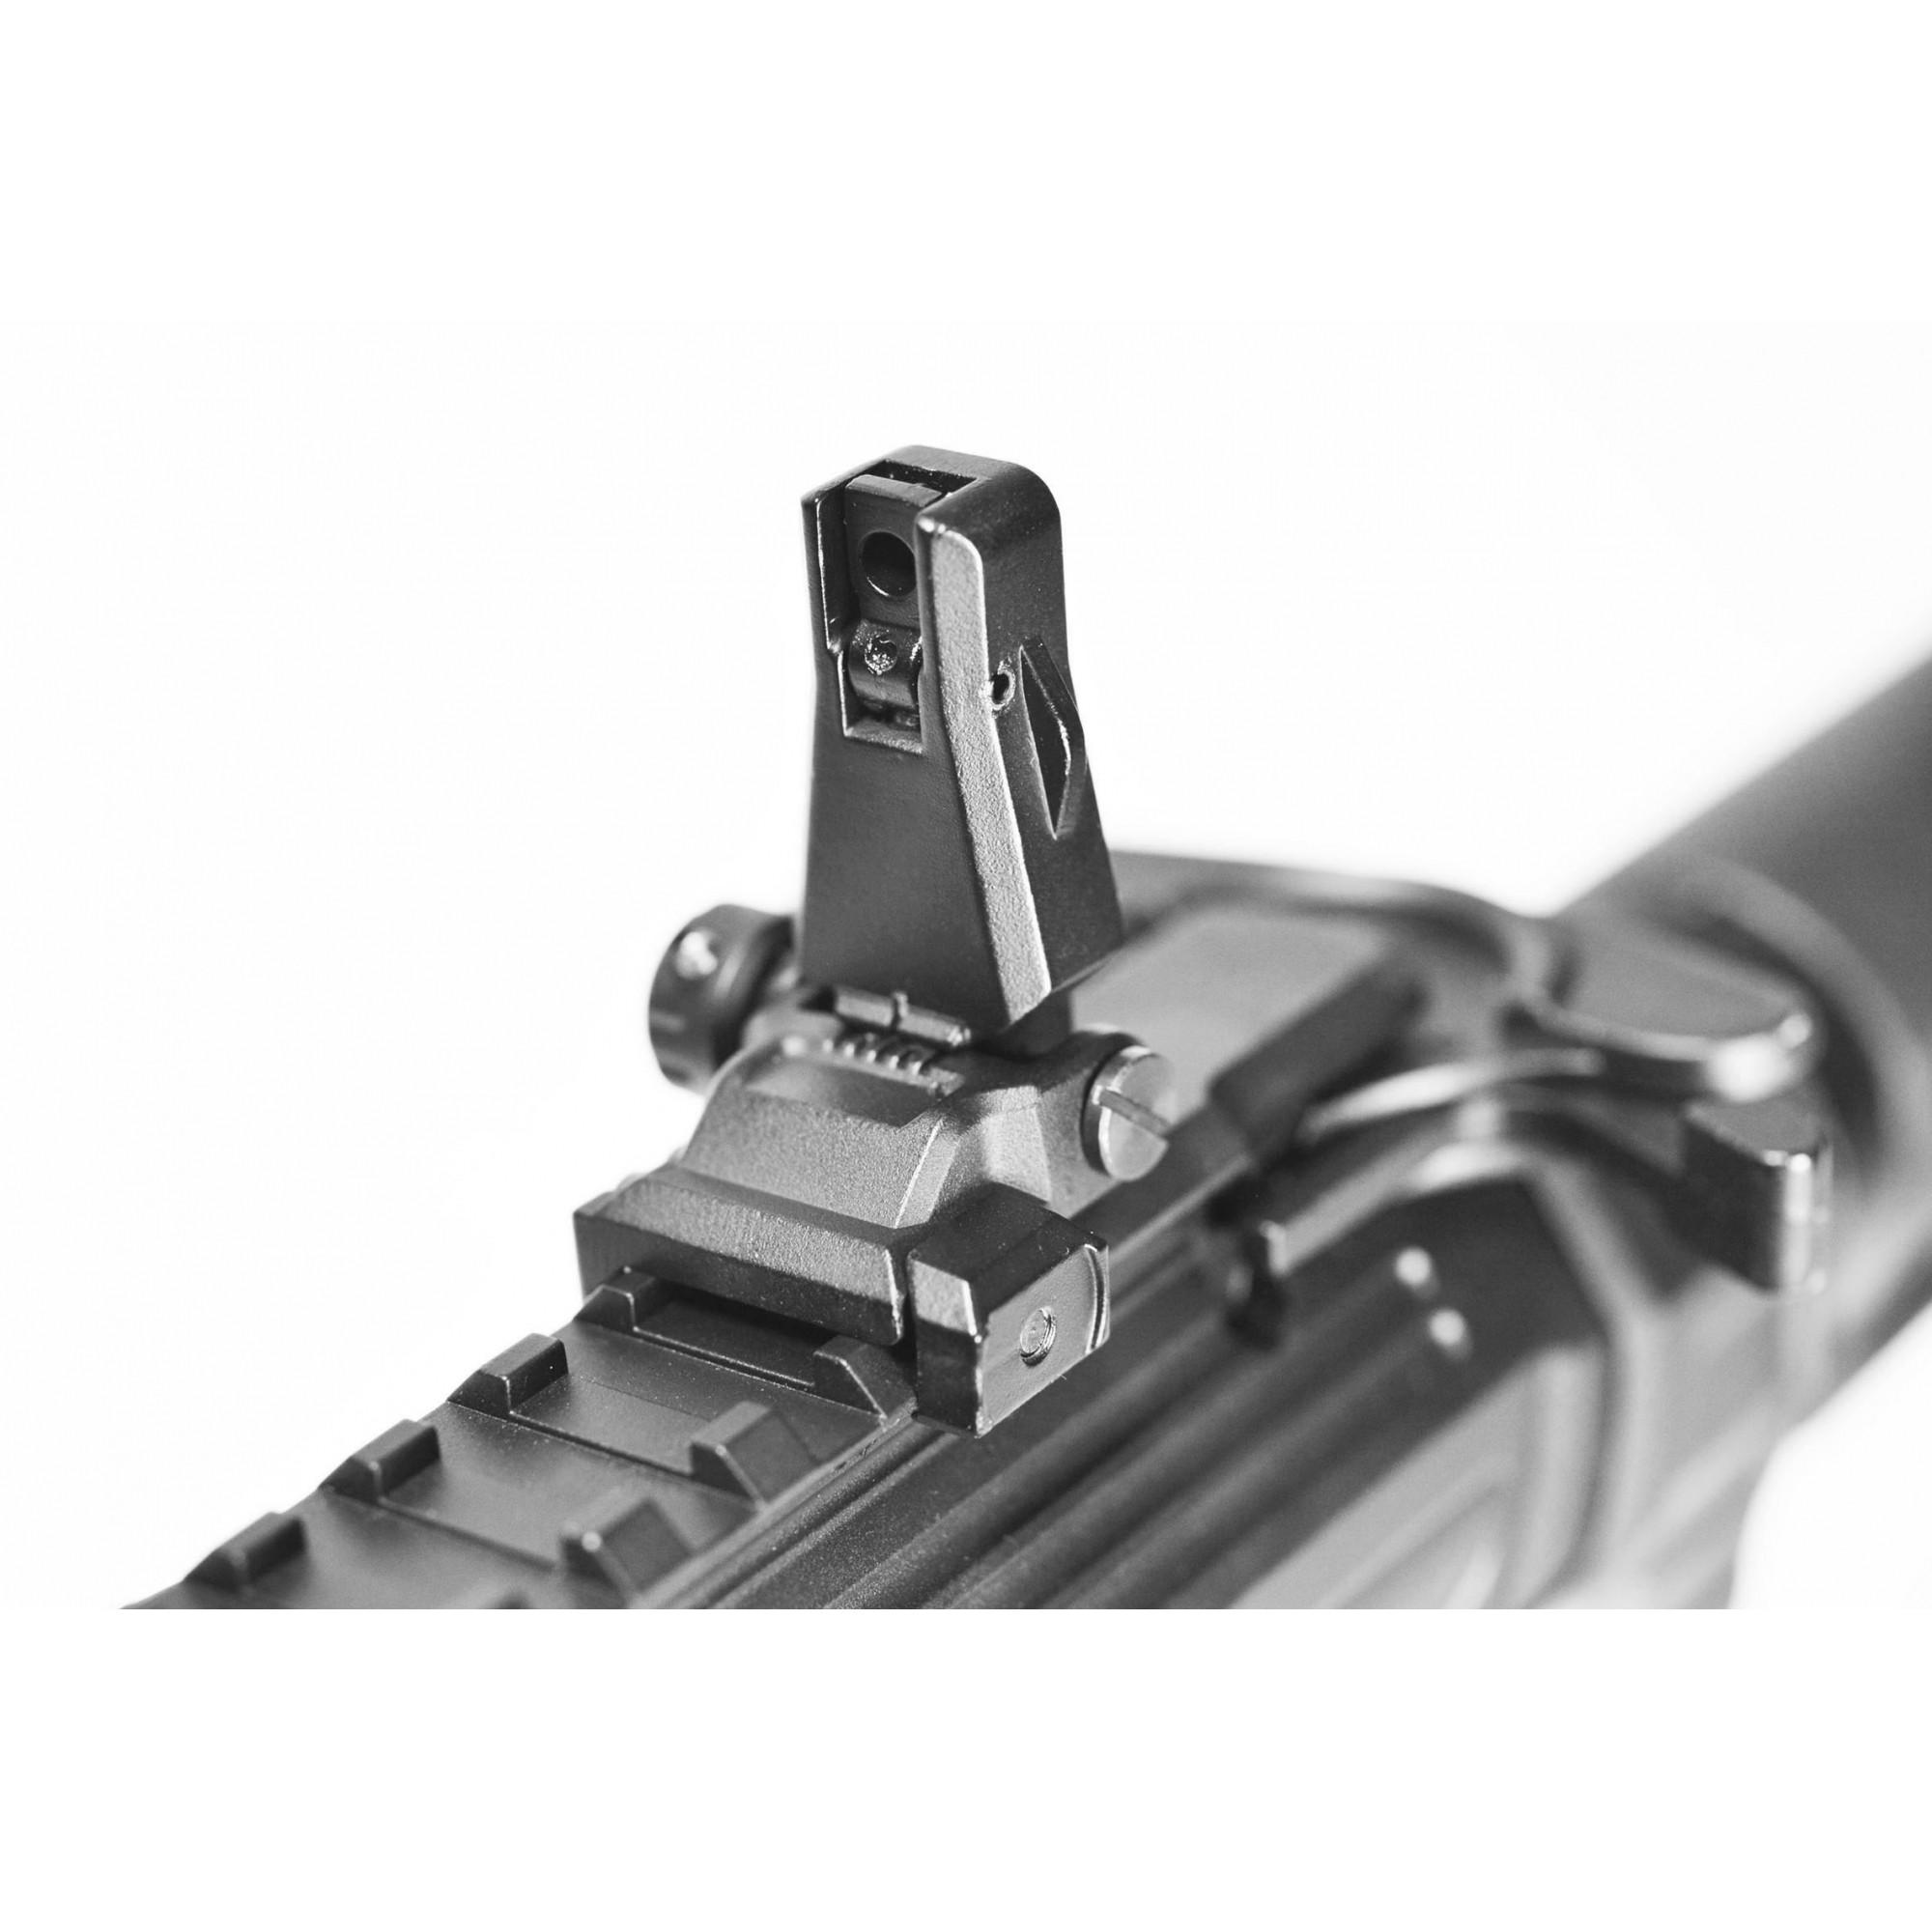 RIFLE DE AIRSOFT AEG M4 PHANTOM EXTREMIS MK8 eSILVER EDGE FULL METAL BLOWBACK eMARK VIII-B - APS